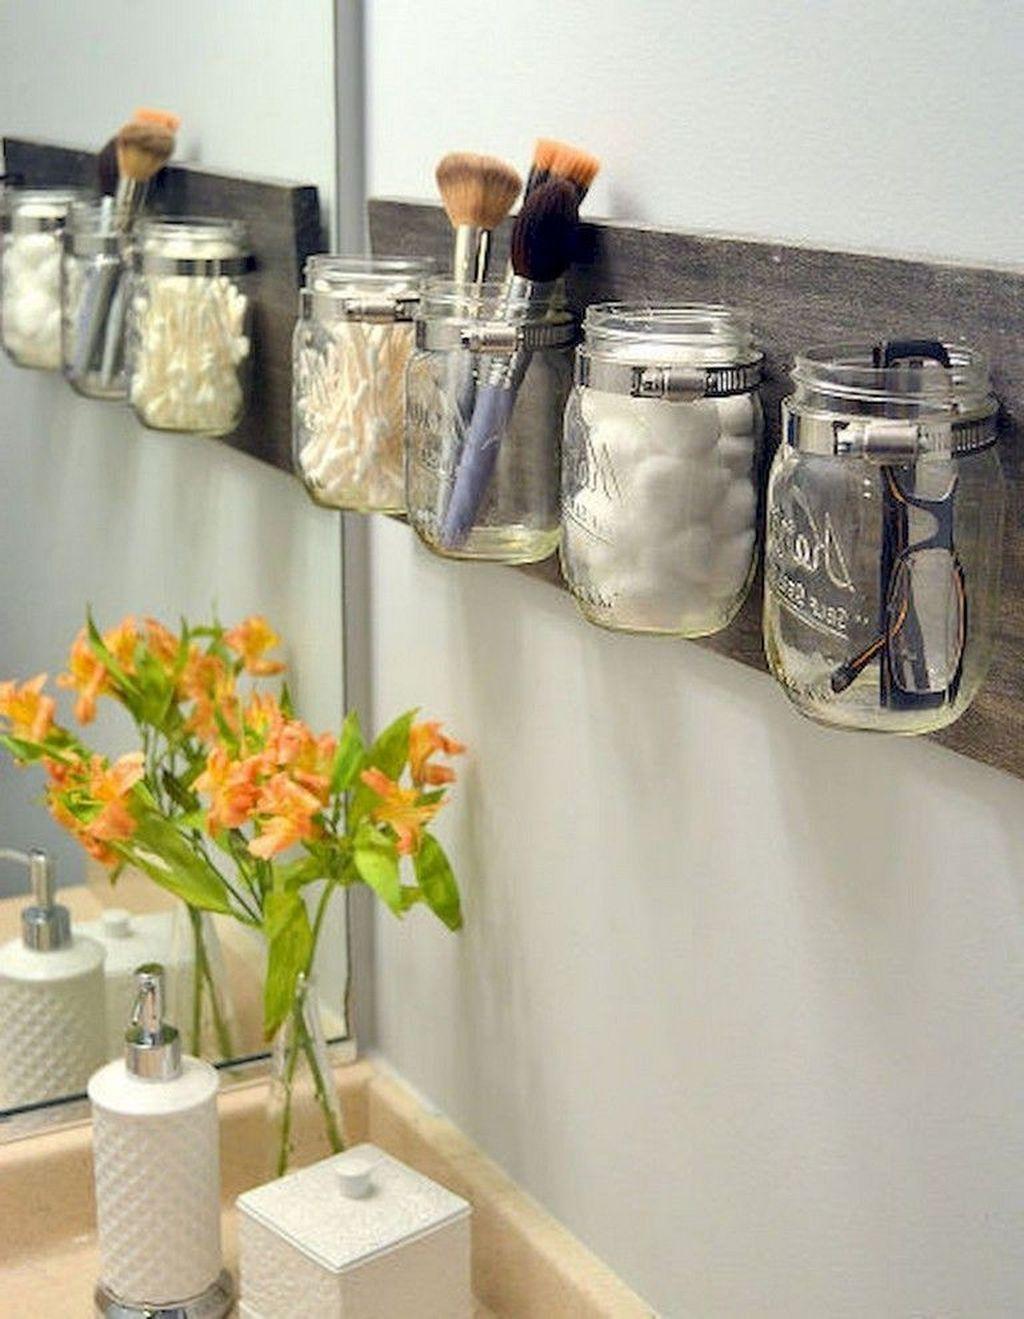 37 Minimalist Apartment Decorating Ideas On A Budget #apartmentdecor